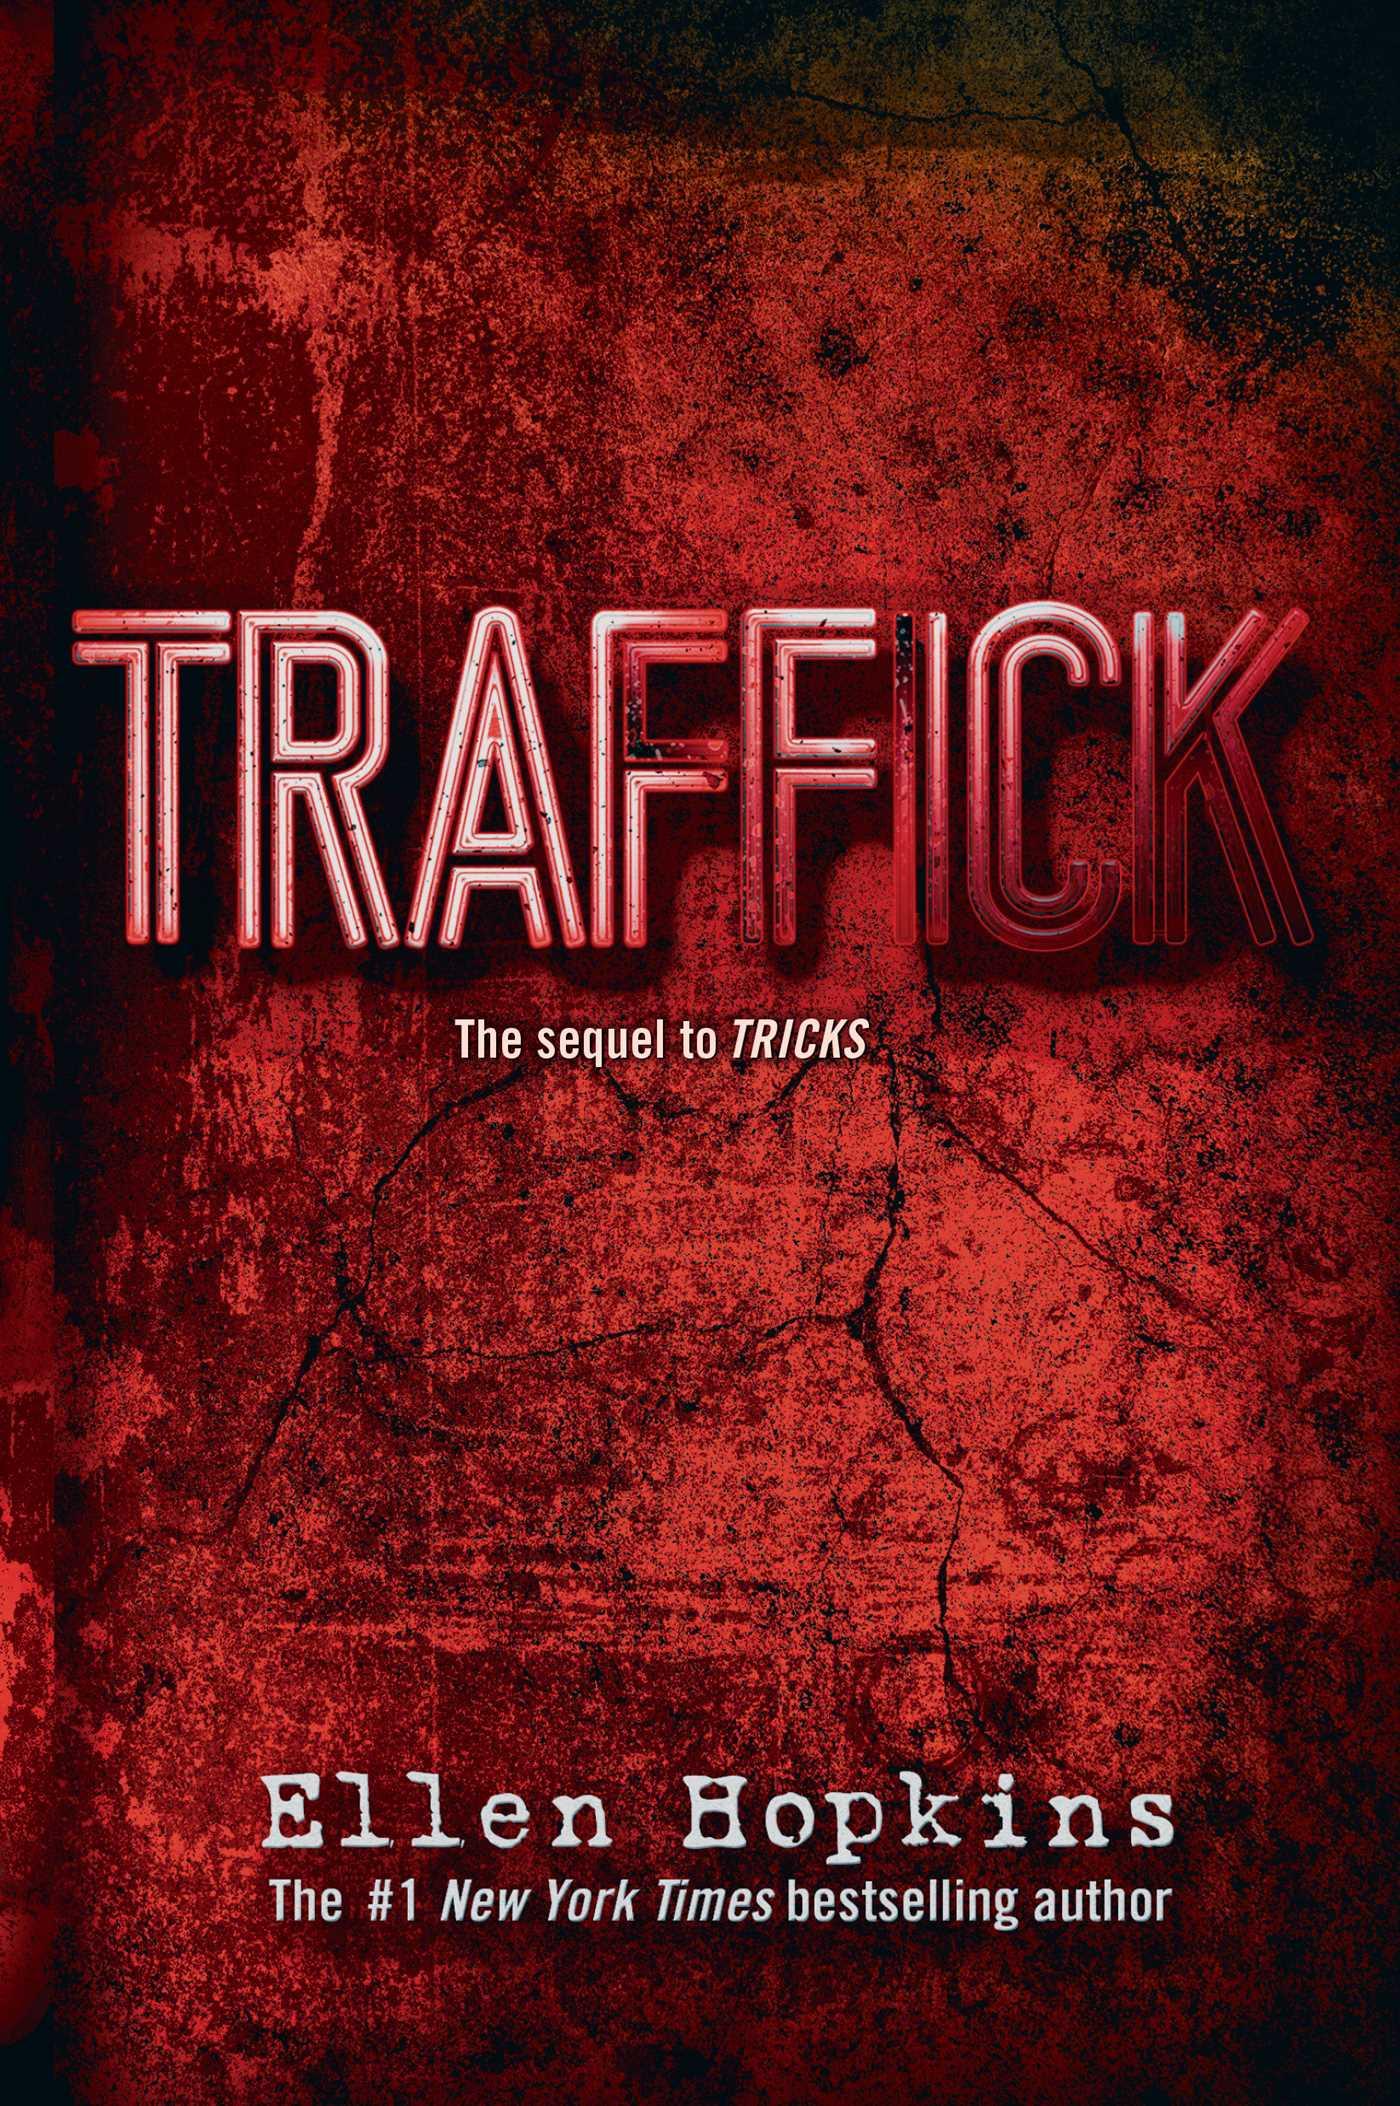 Traffick 9781442482883 hr